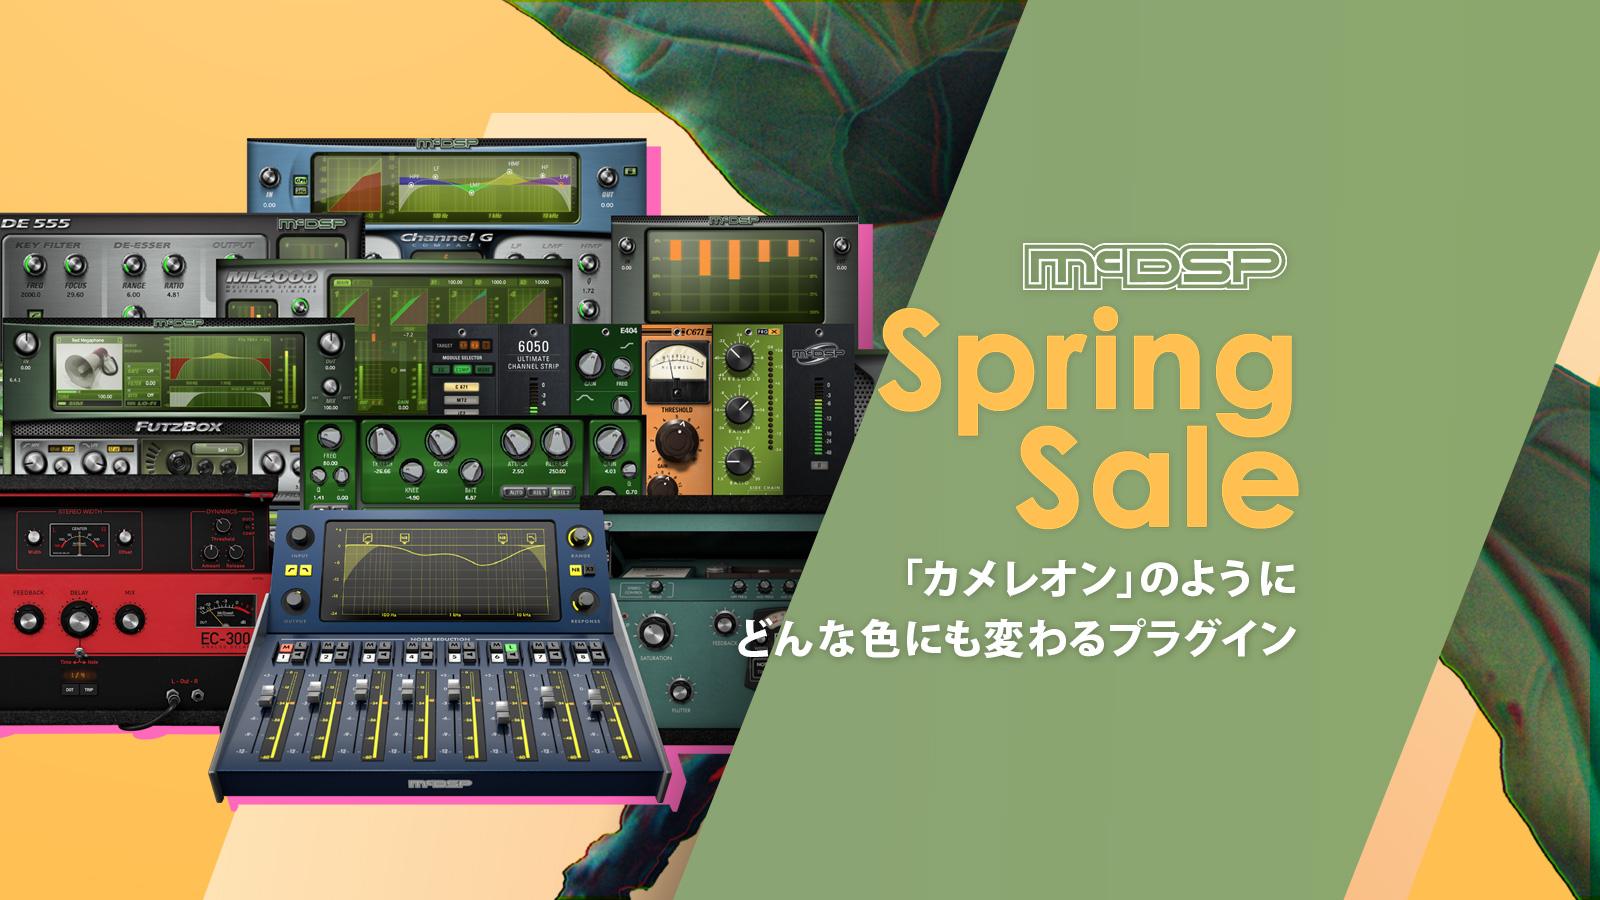 McDSP Spring Saleプロモーション